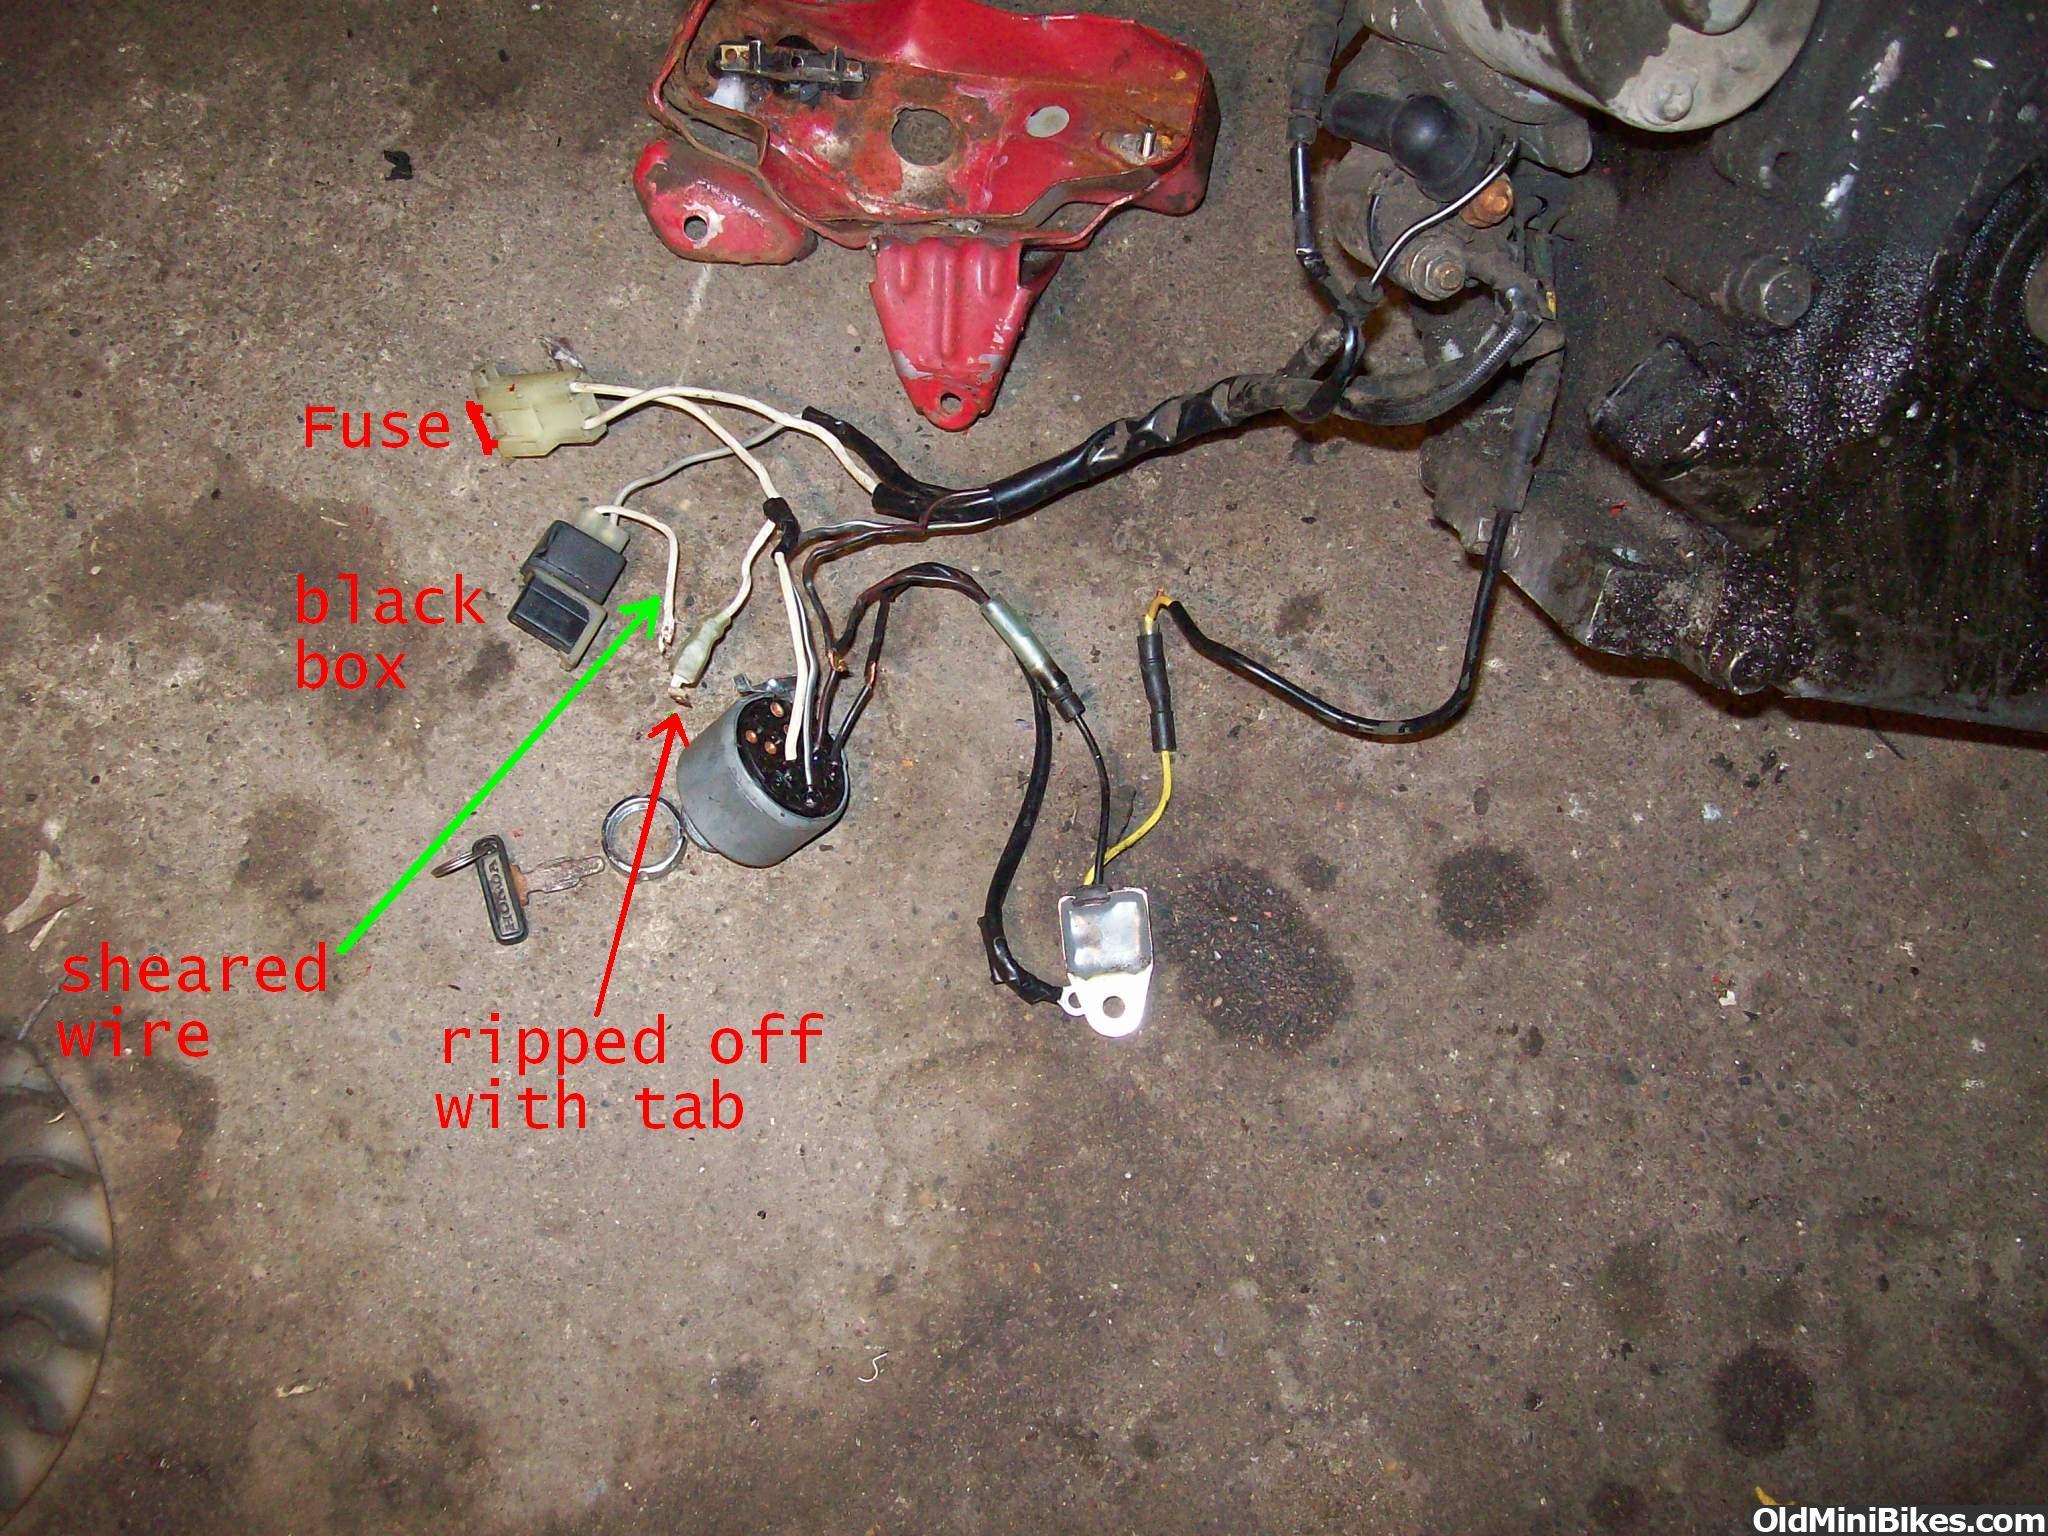 Gx200 Wiring Diagram - Subaru Engine Coolant - piping.2001ajau.waystar.fr | Gx160 Wiring Diagram |  | Wiring Diagram Resource